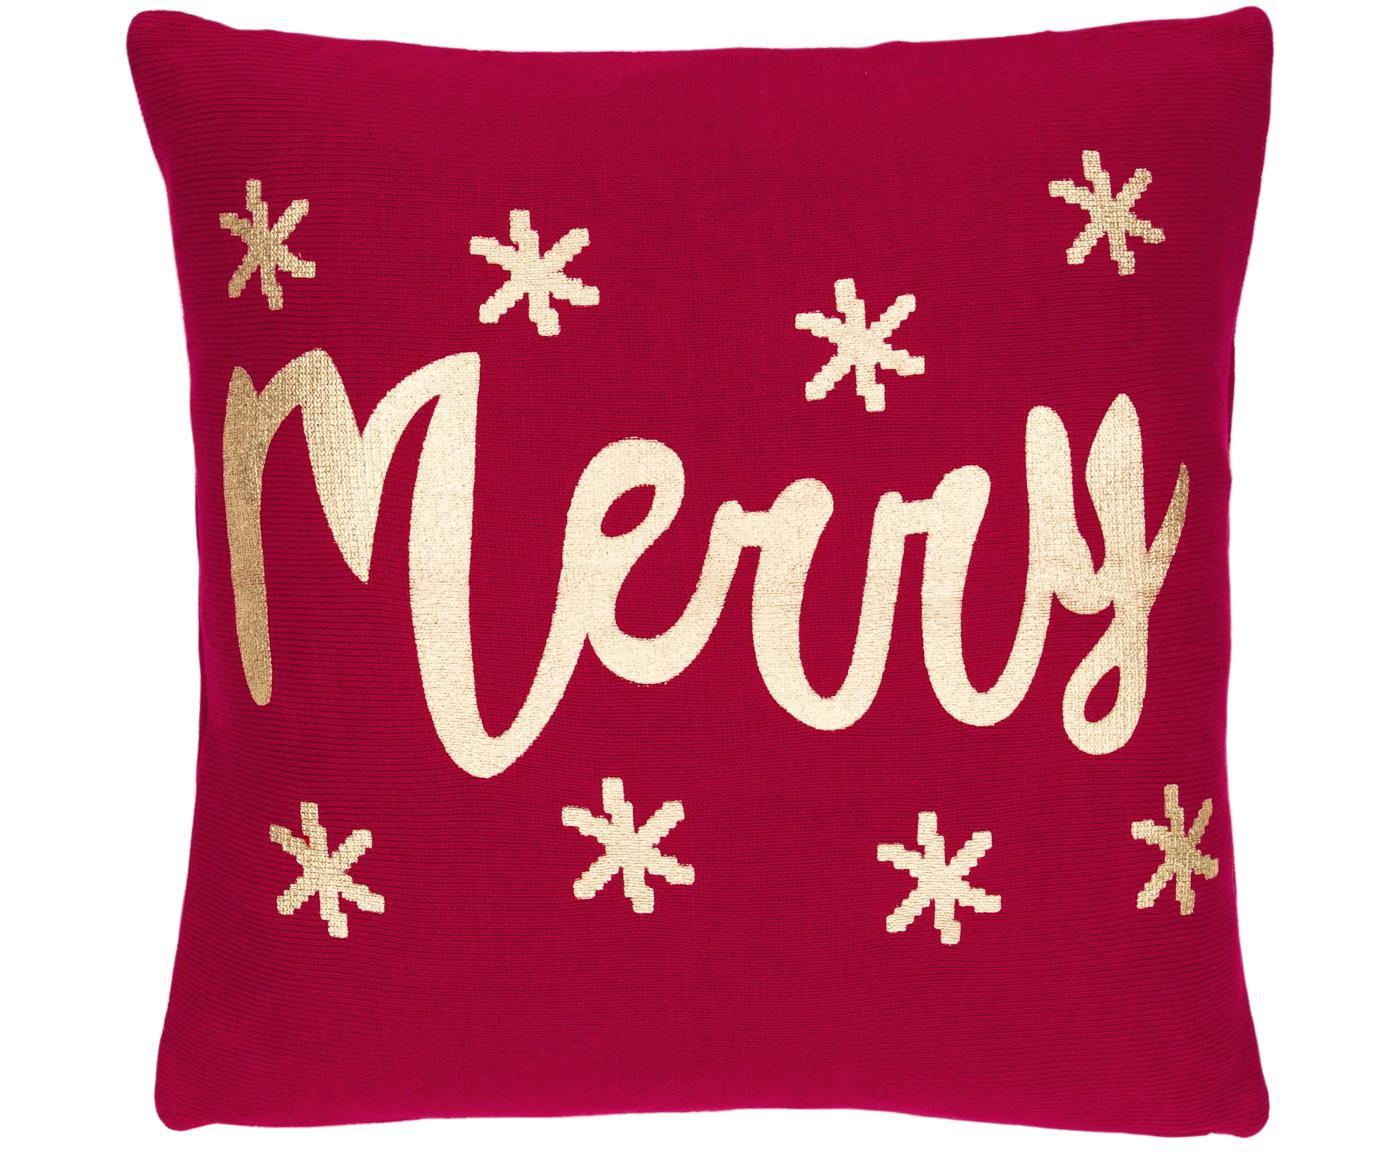 Gebreide kussenhoes Merry, 100% katoen, Rood, goudkleurig, 40 x 40 cm